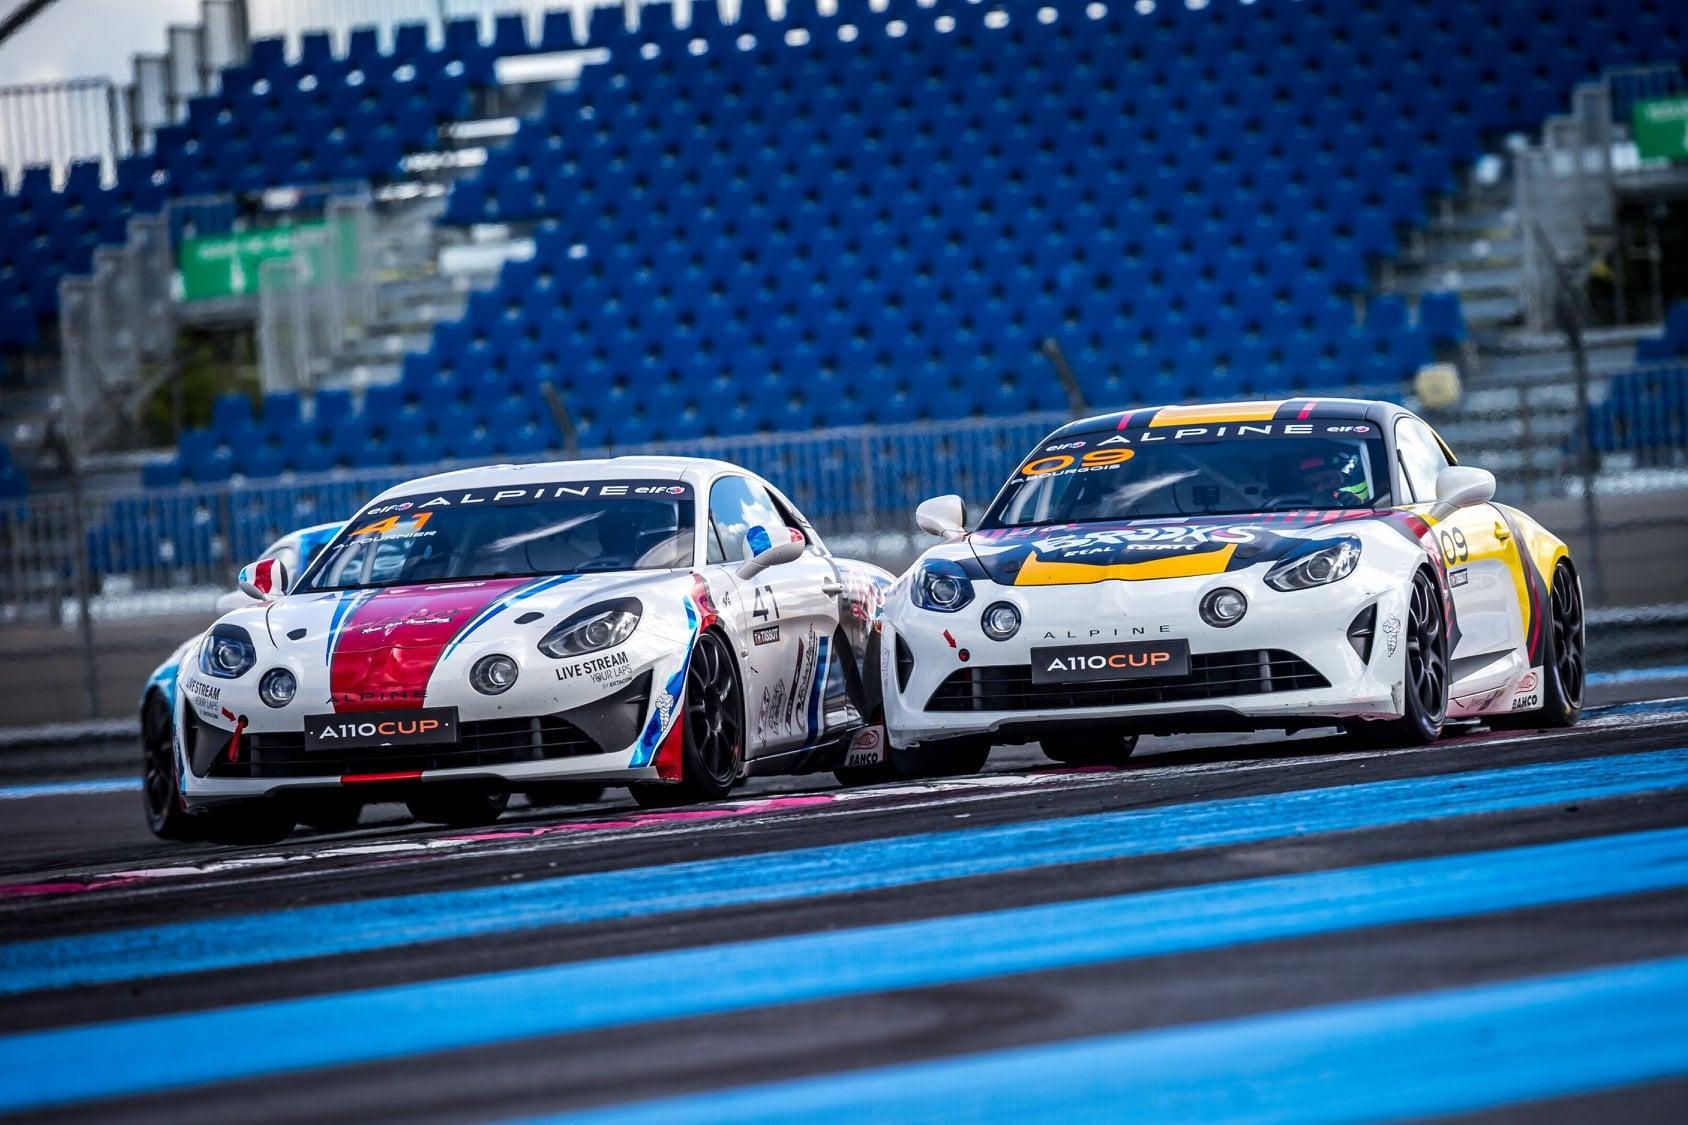 Alpine Elf Europa Cup 2020 Castellet 2020 A110 33 | Alpine Elf Europa Cup 2020: Jean-Baptiste Mela et Laurent Hurgon dominent au Castellet